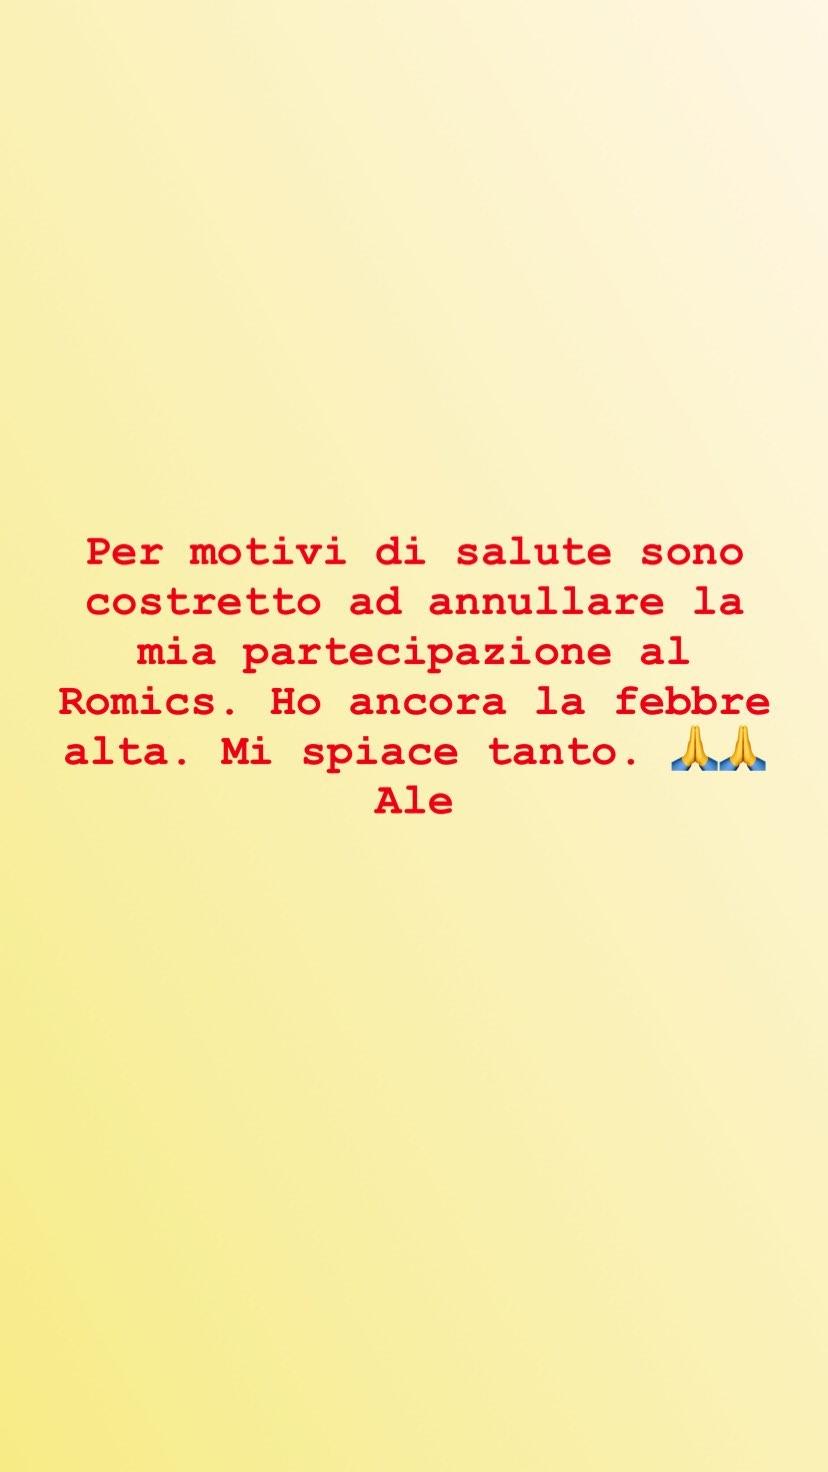 Florenzi Romics